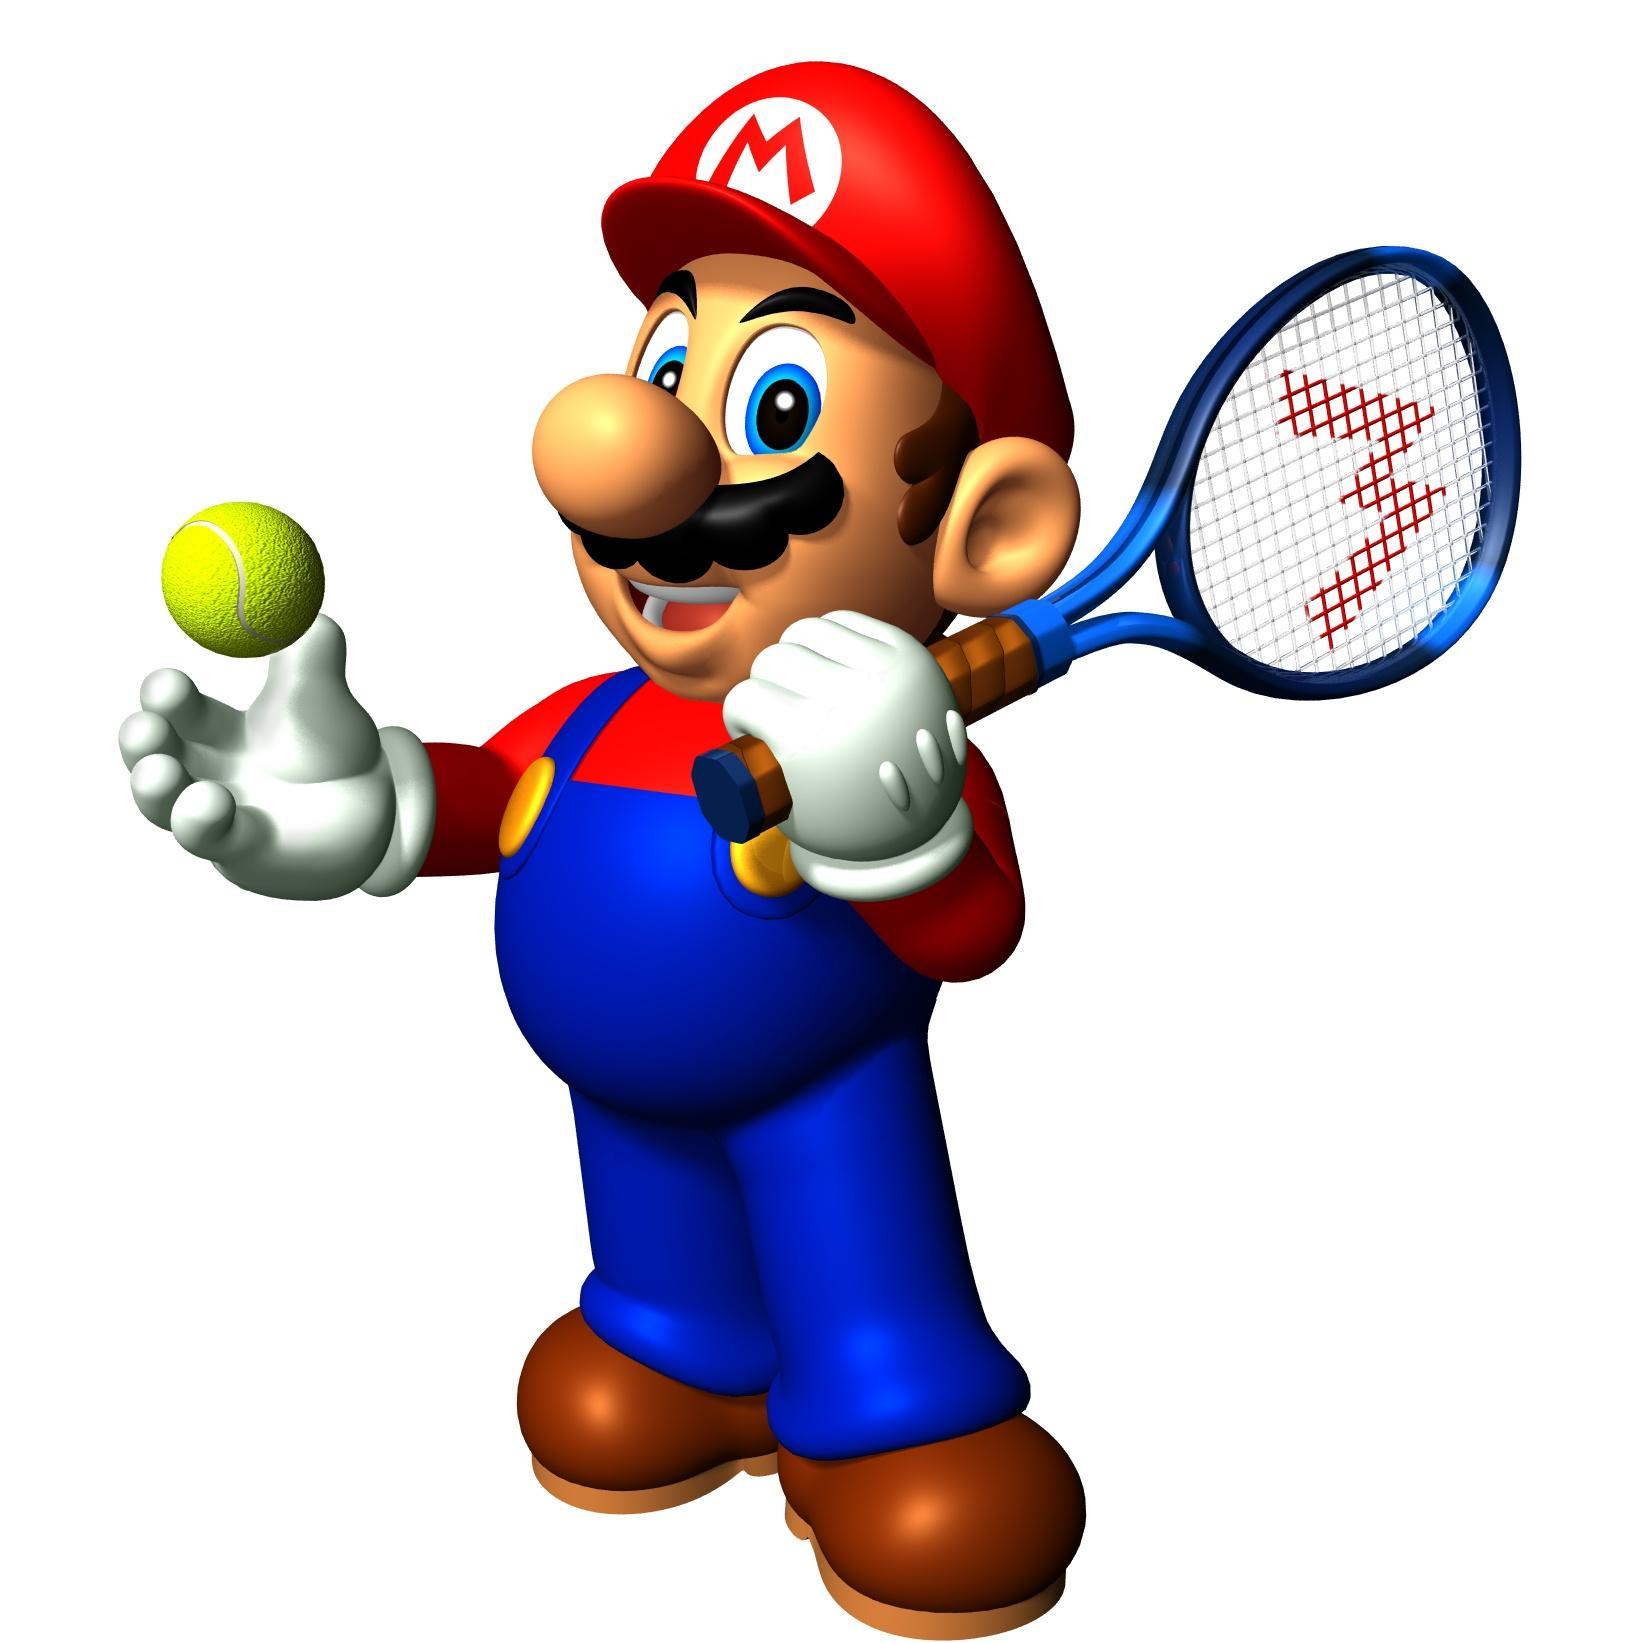 Mario Tennis 64 Nintendo 64 Artwork Including Characters